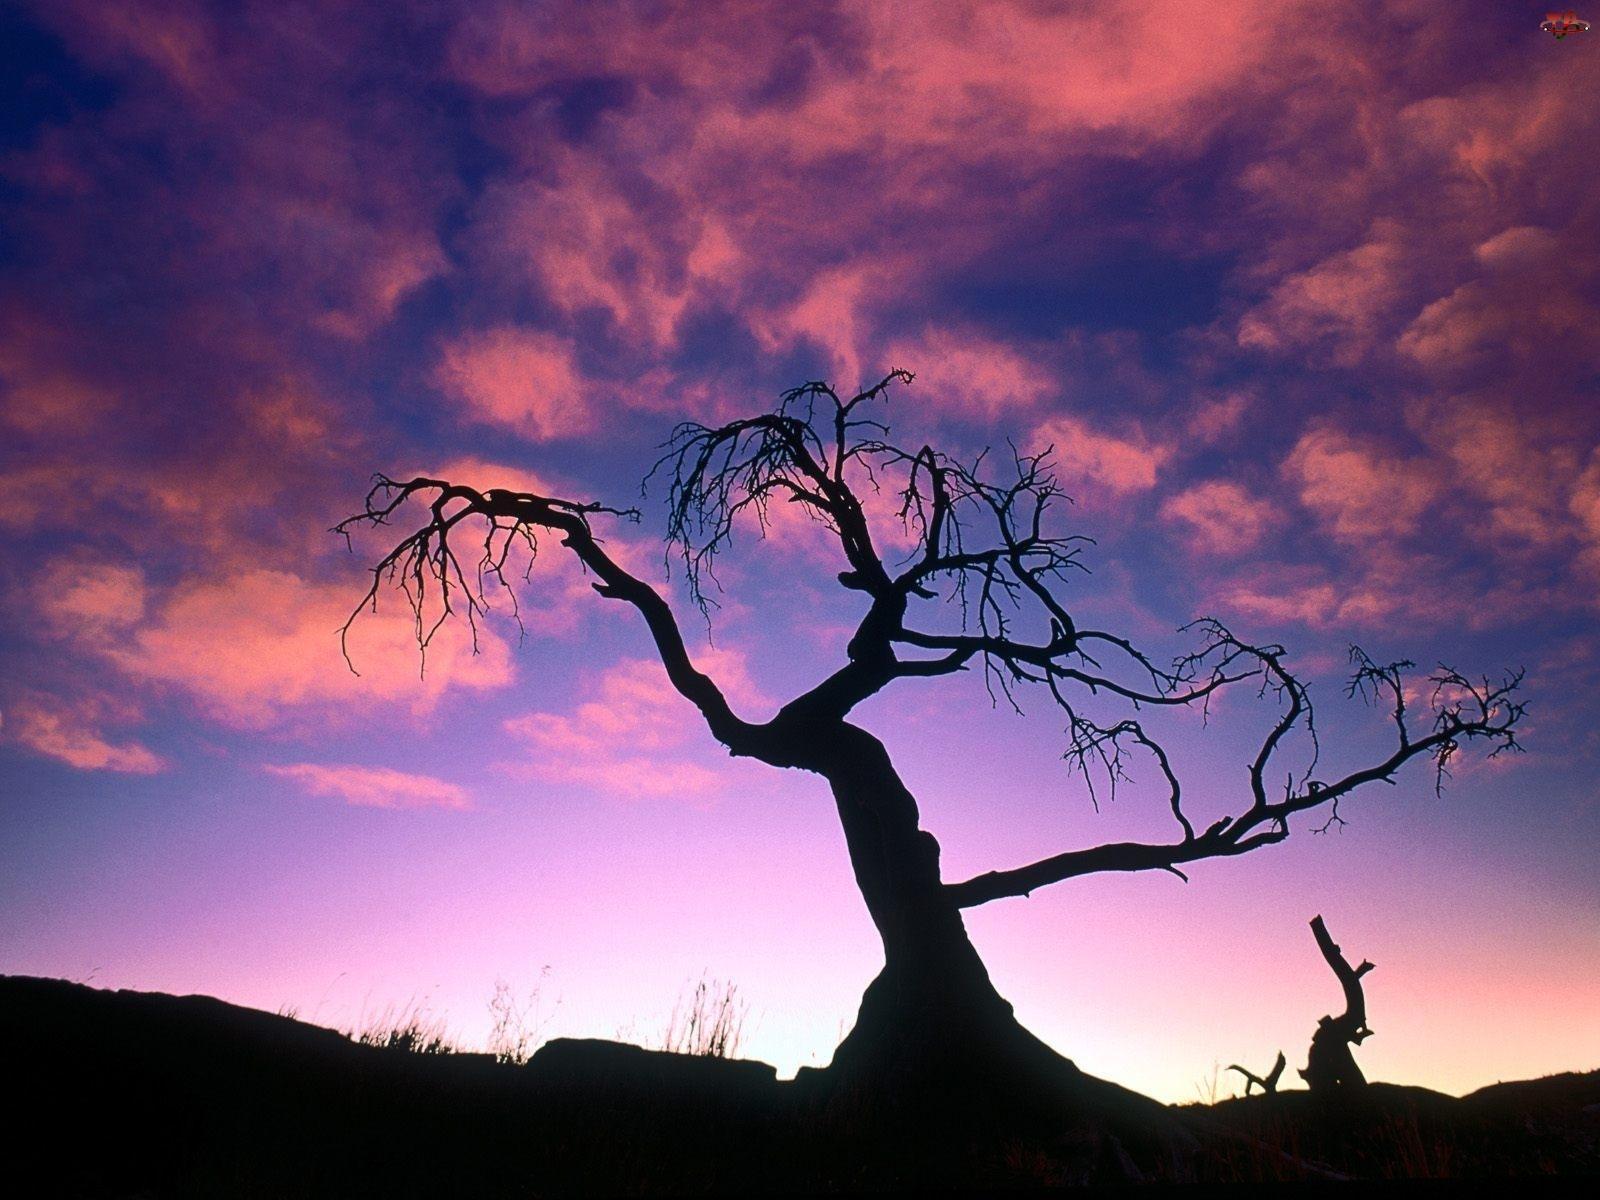 Suche, Niebo, Drzewo, Fioletowe